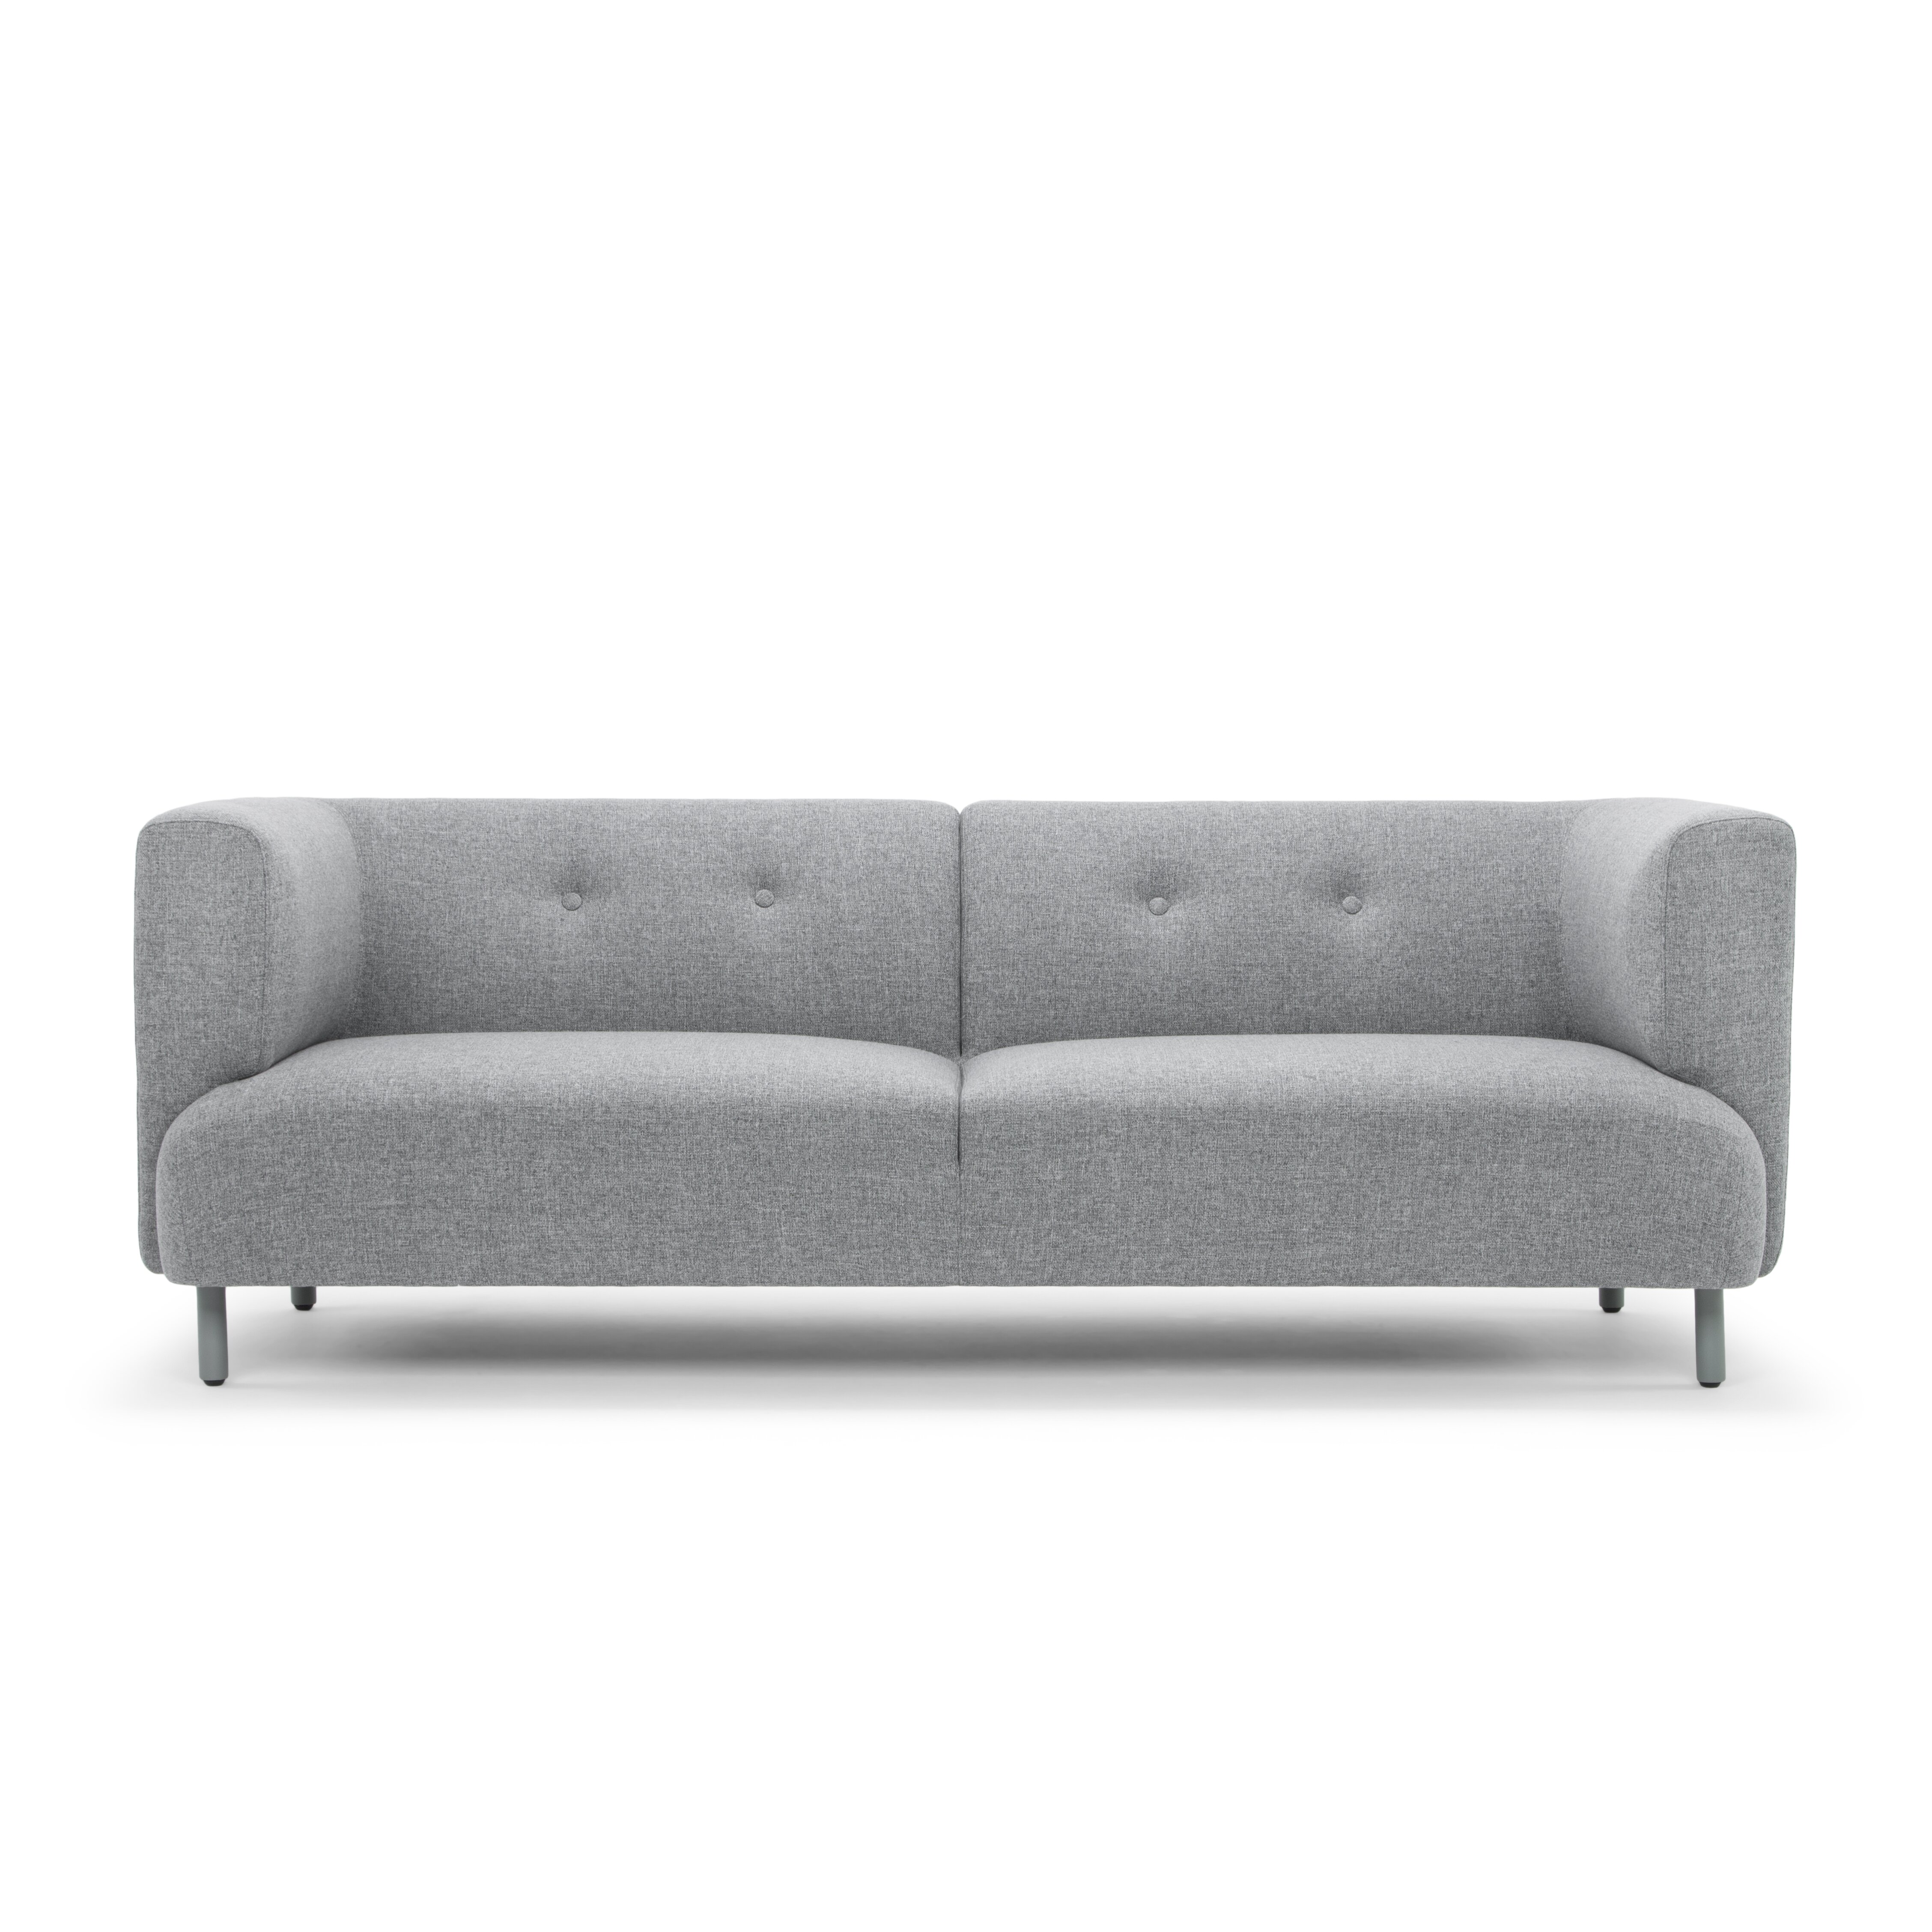 Nordic upholstery soren classic modern sofa wayfair for Sofa nordic